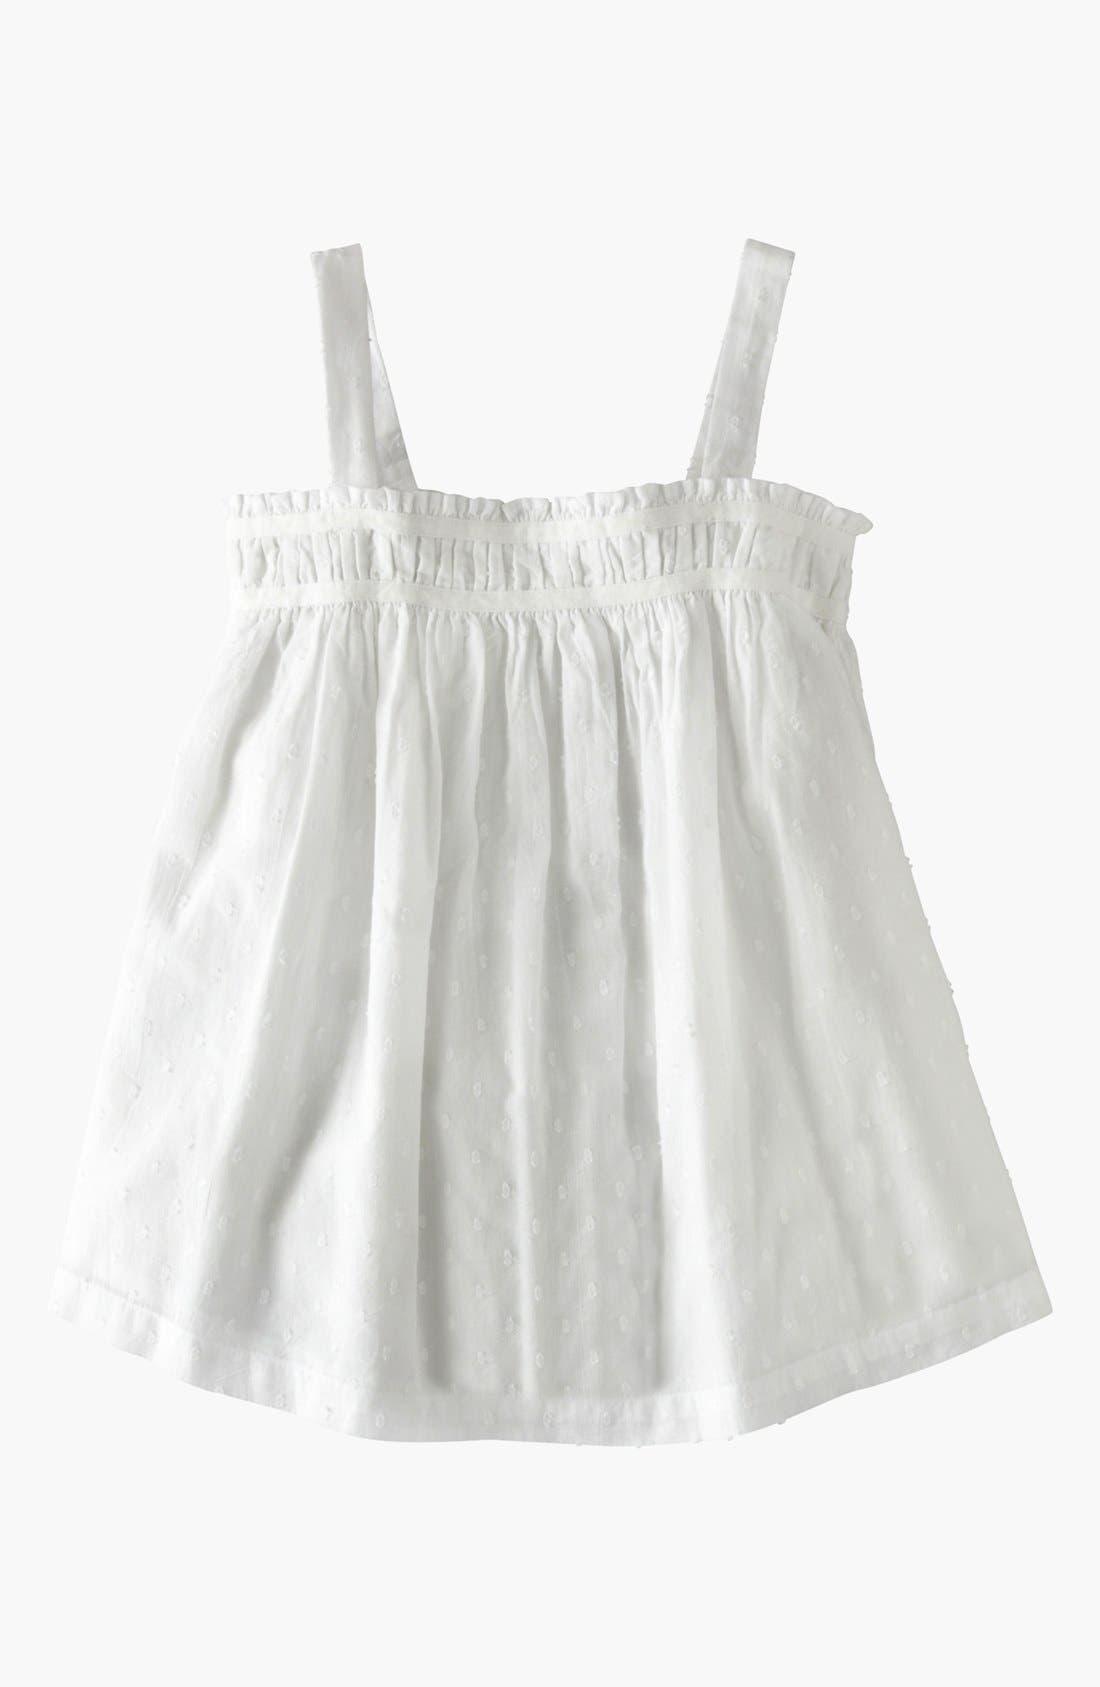 Alternate Image 1 Selected - Mini Boden 'Summer Days' Smocked Top (Toddler, Little Girls & Big Girls)